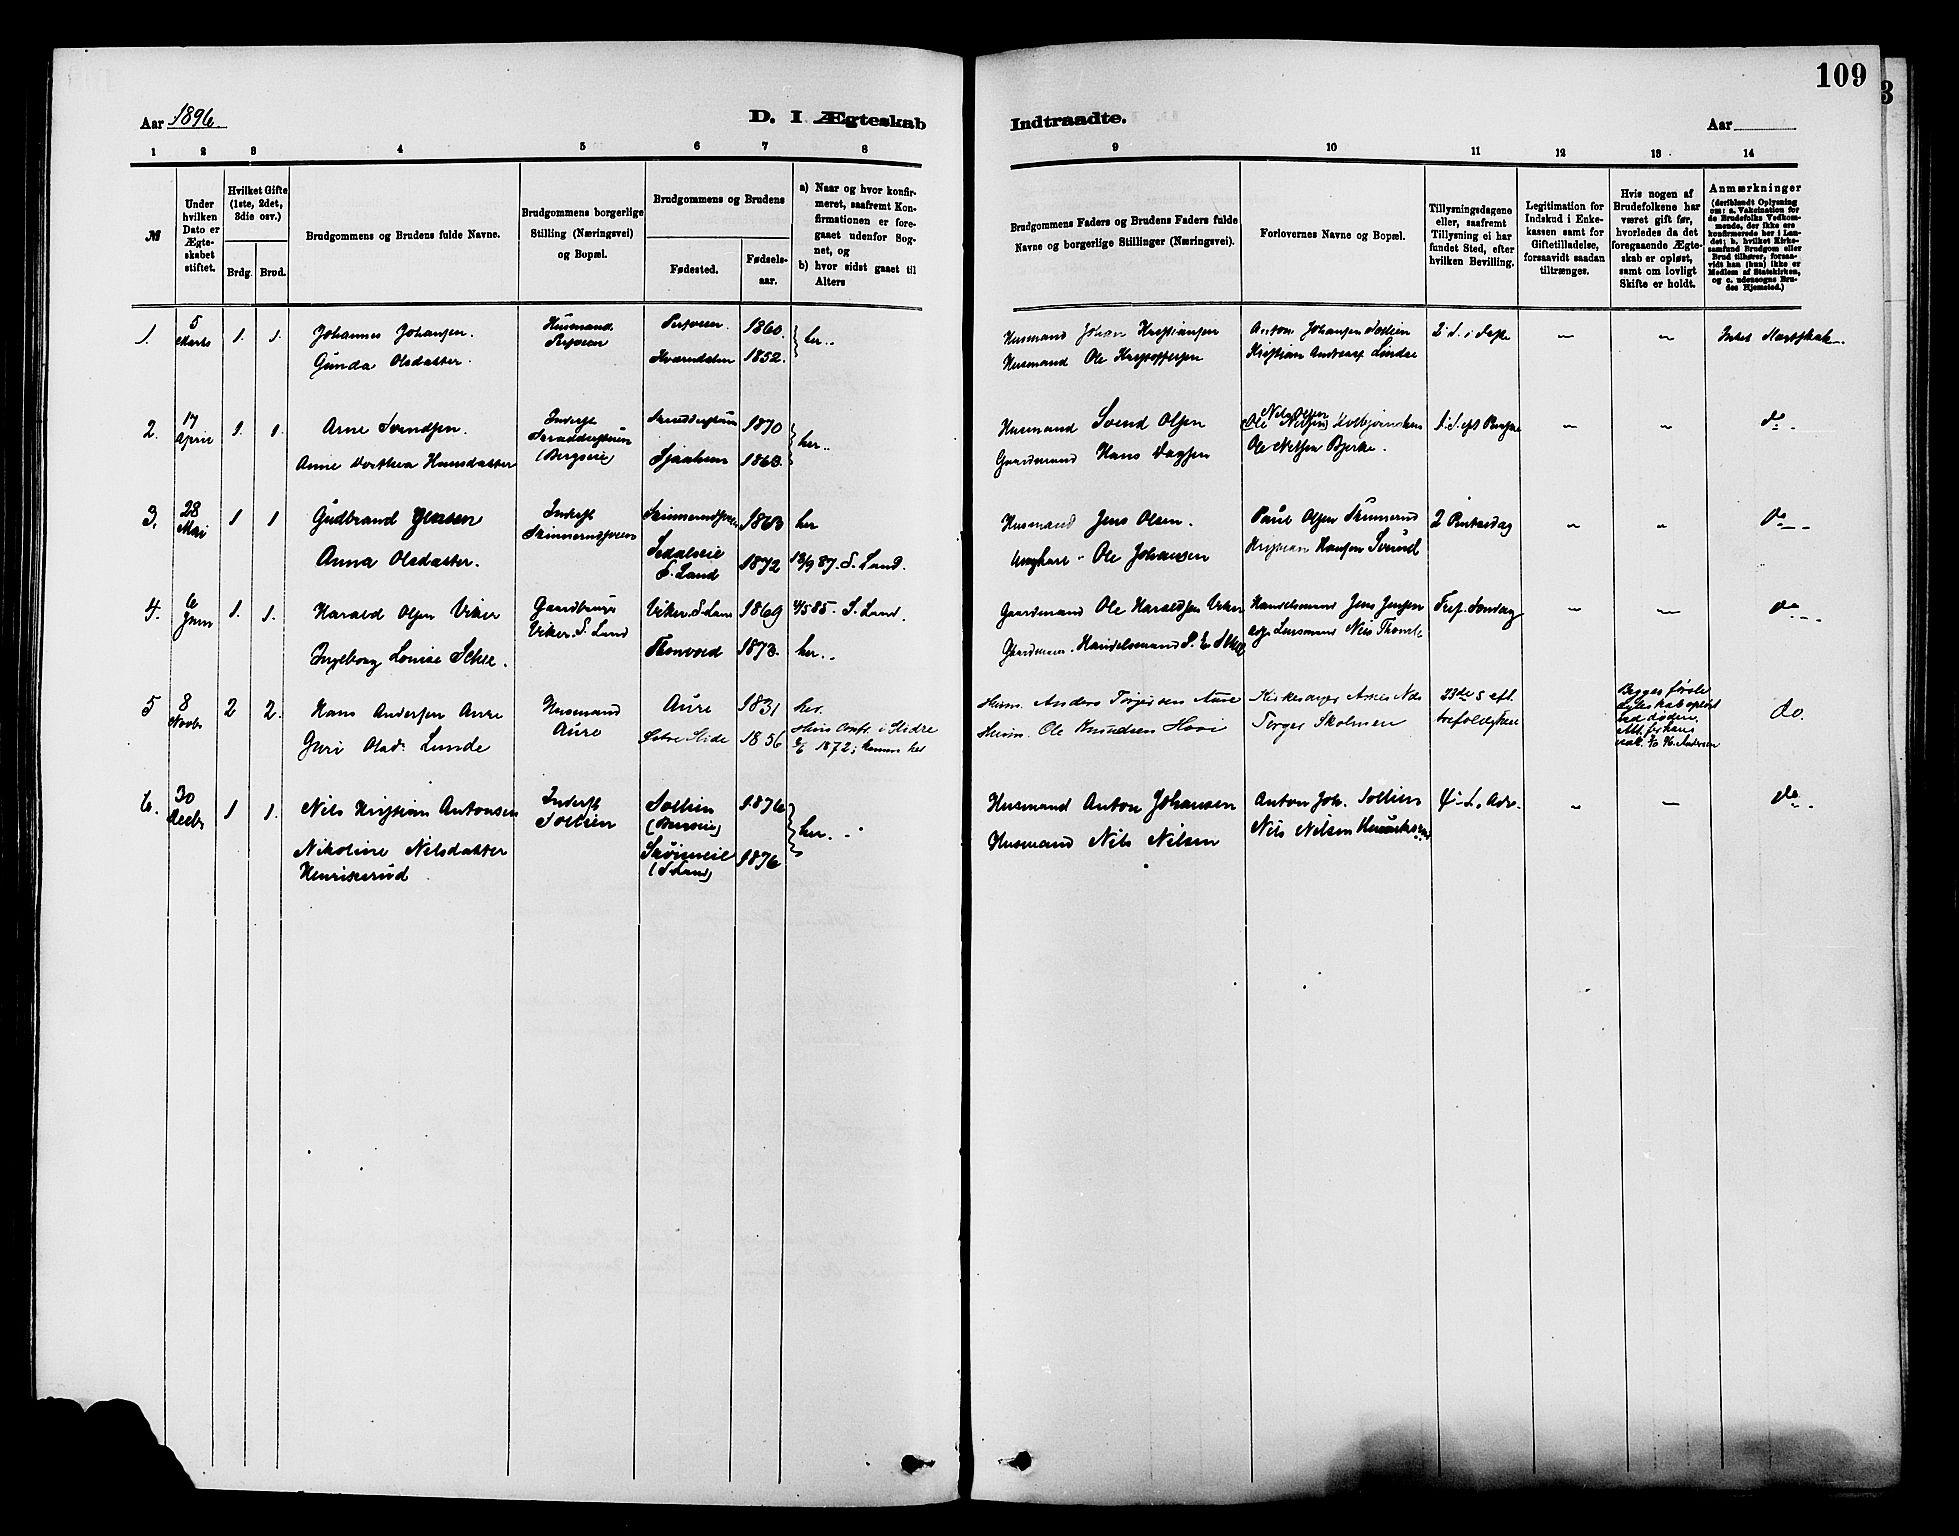 SAH, Nordre Land prestekontor, Ministerialbok nr. 3, 1882-1896, s. 109